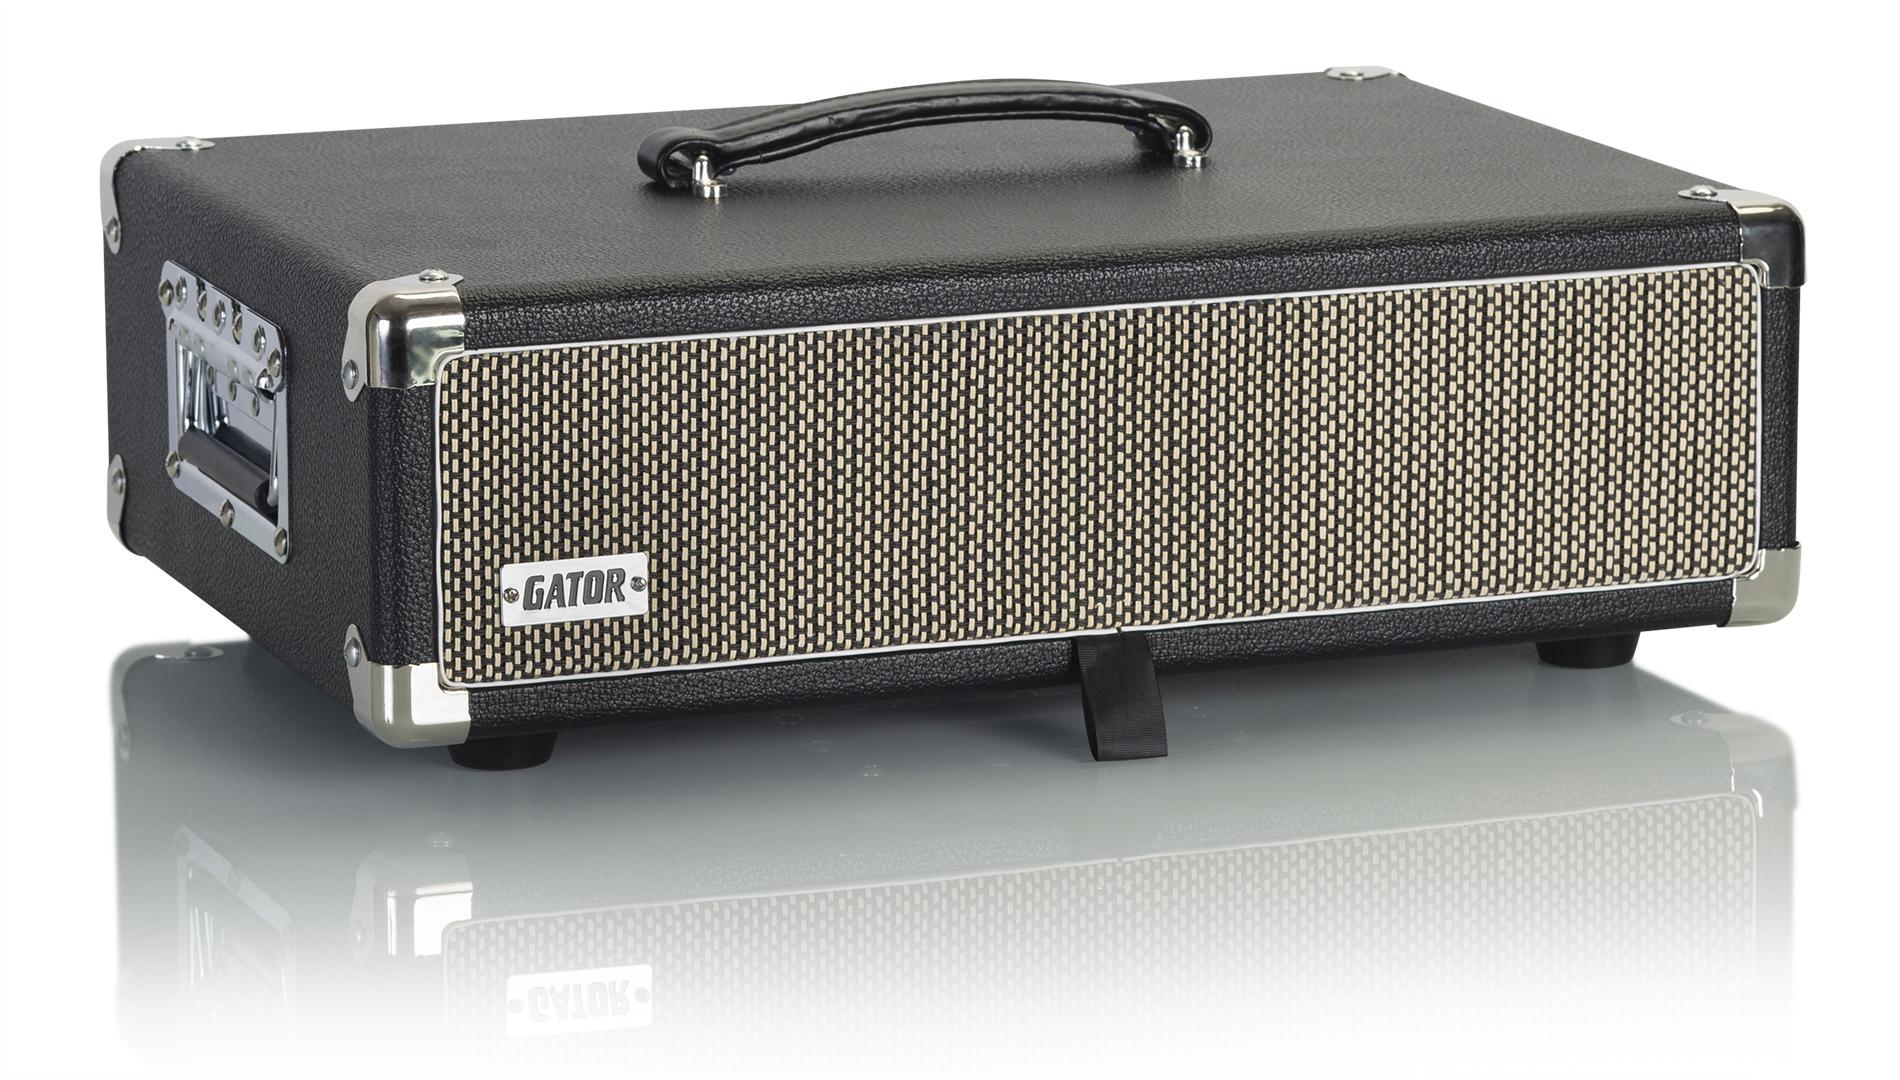 50 s amp style rack case 2u black